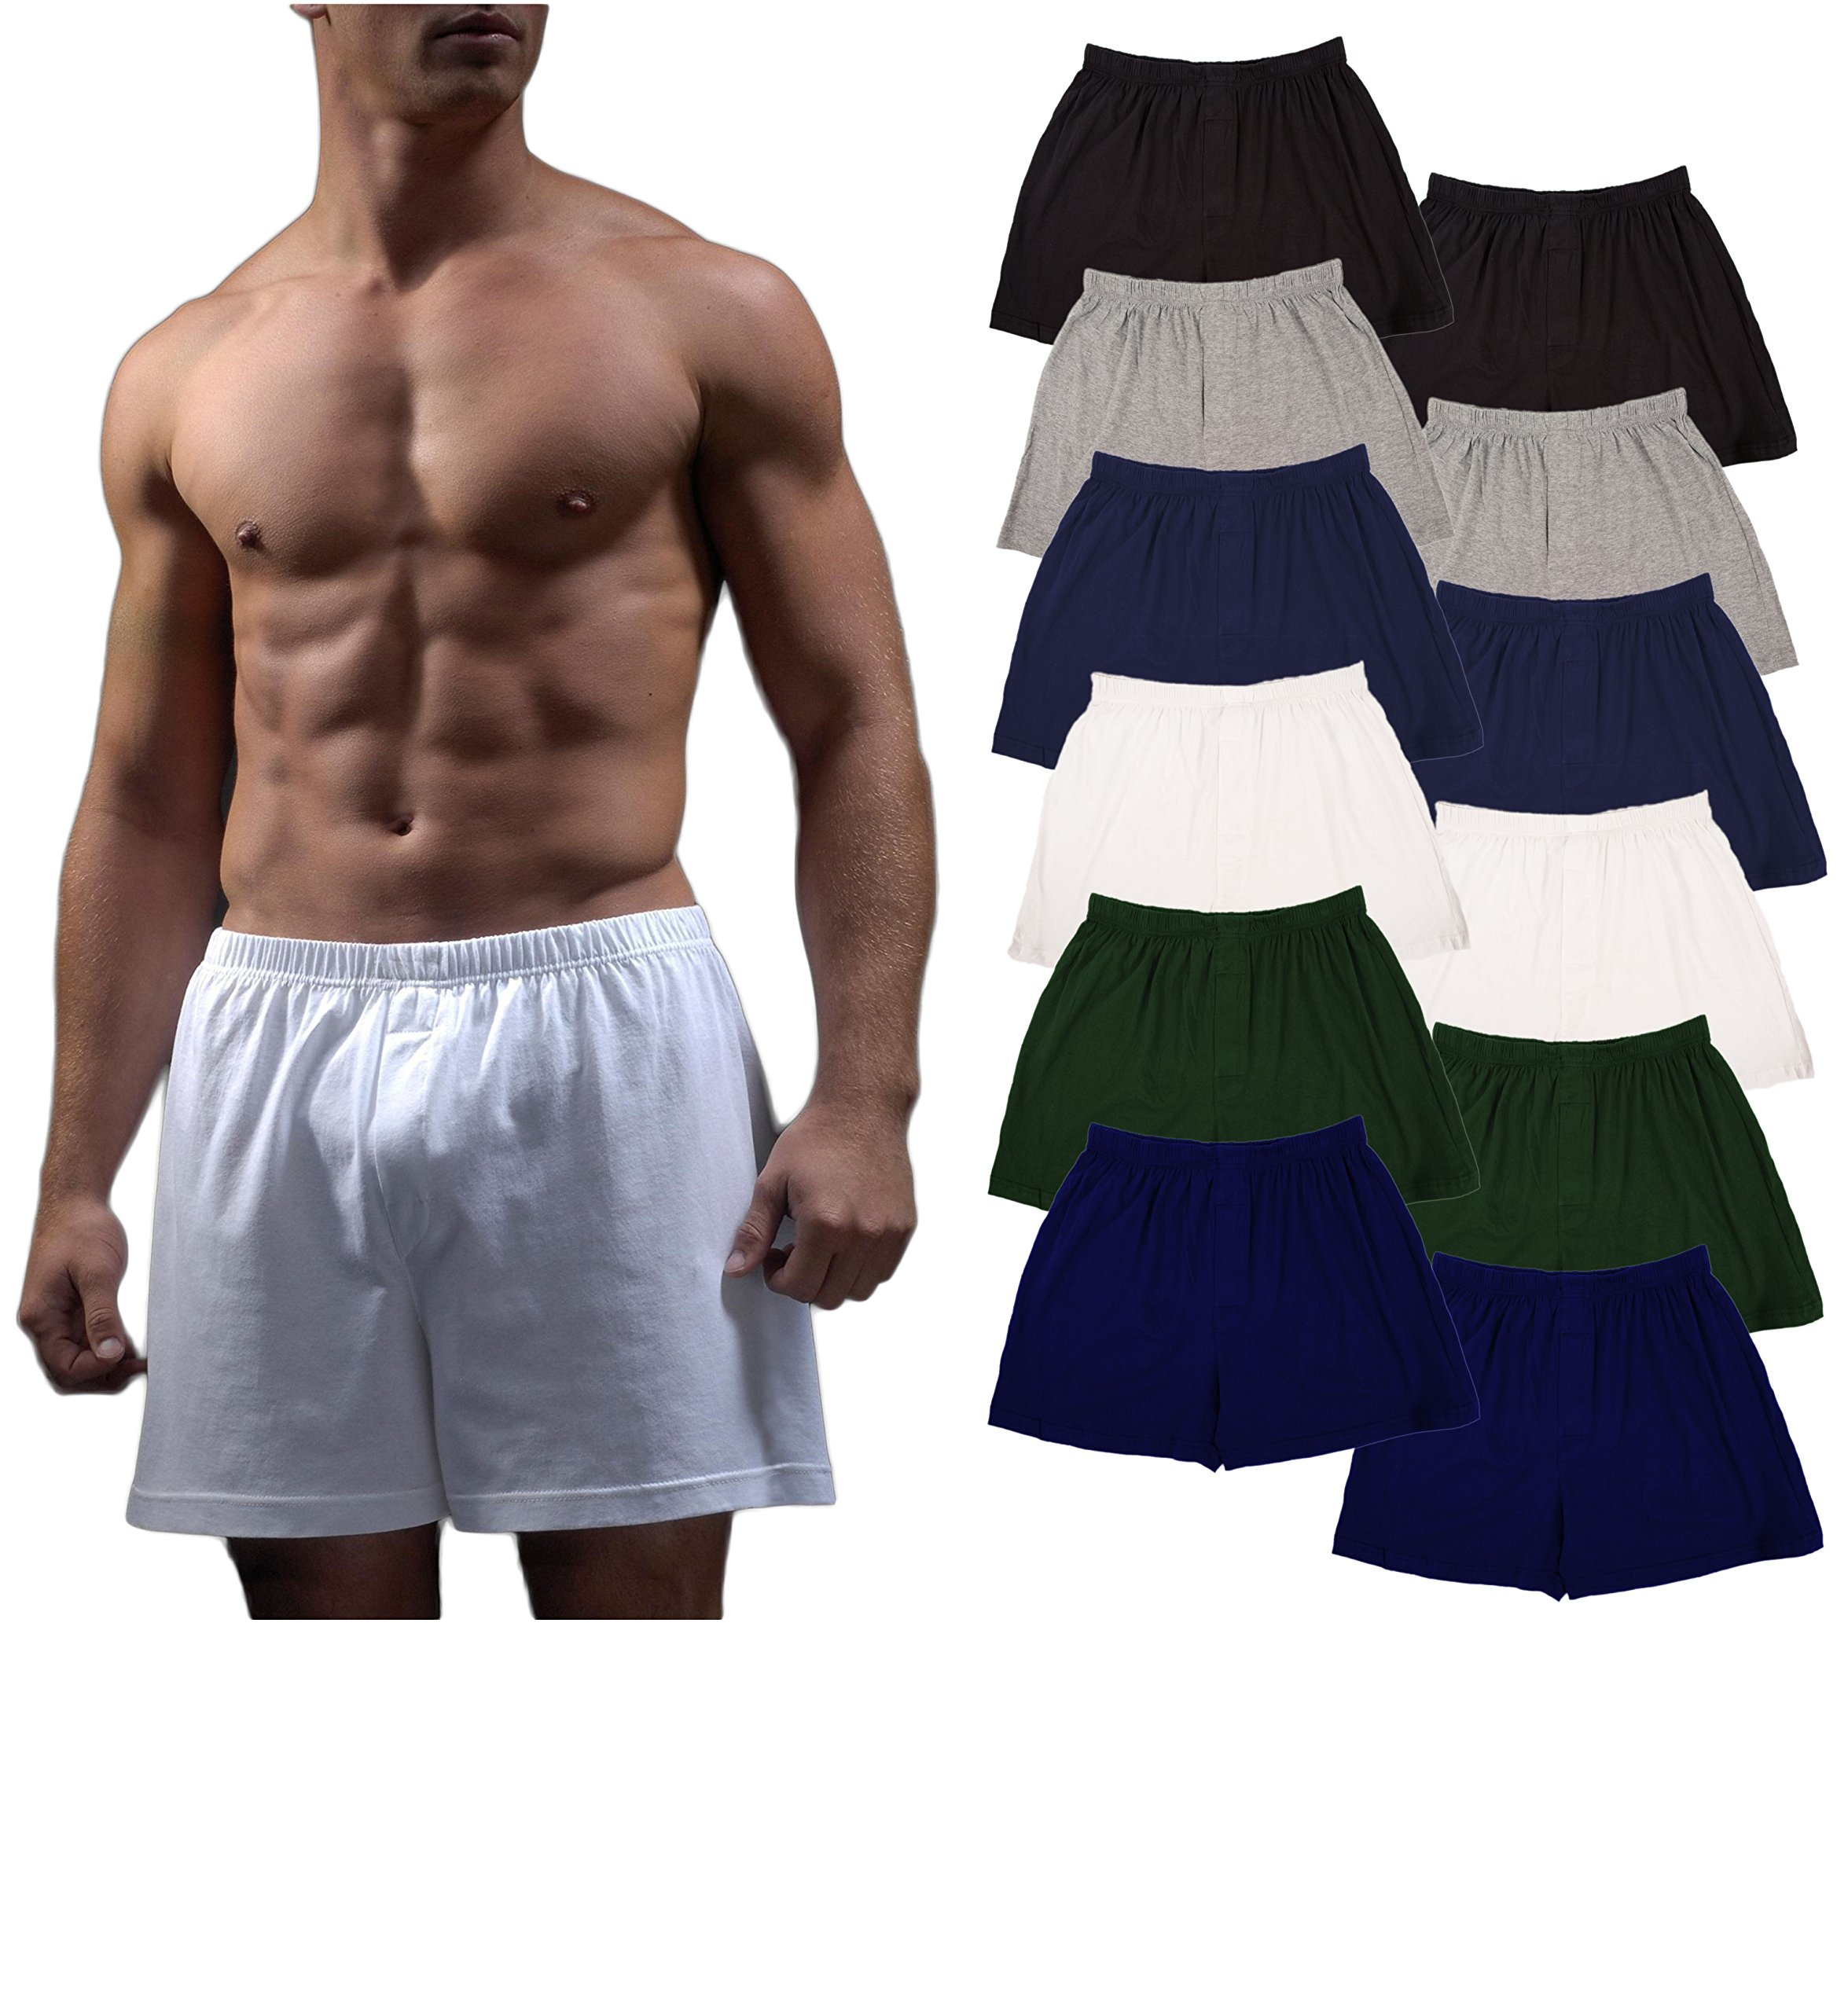 Andrew Scott Men's 12 Pack King Size Big Man Cotton Knit Sleep Boxer Shorts (12 Pack - Black/Gey/Navy/White/Hunter/Royal, 3X-Large)